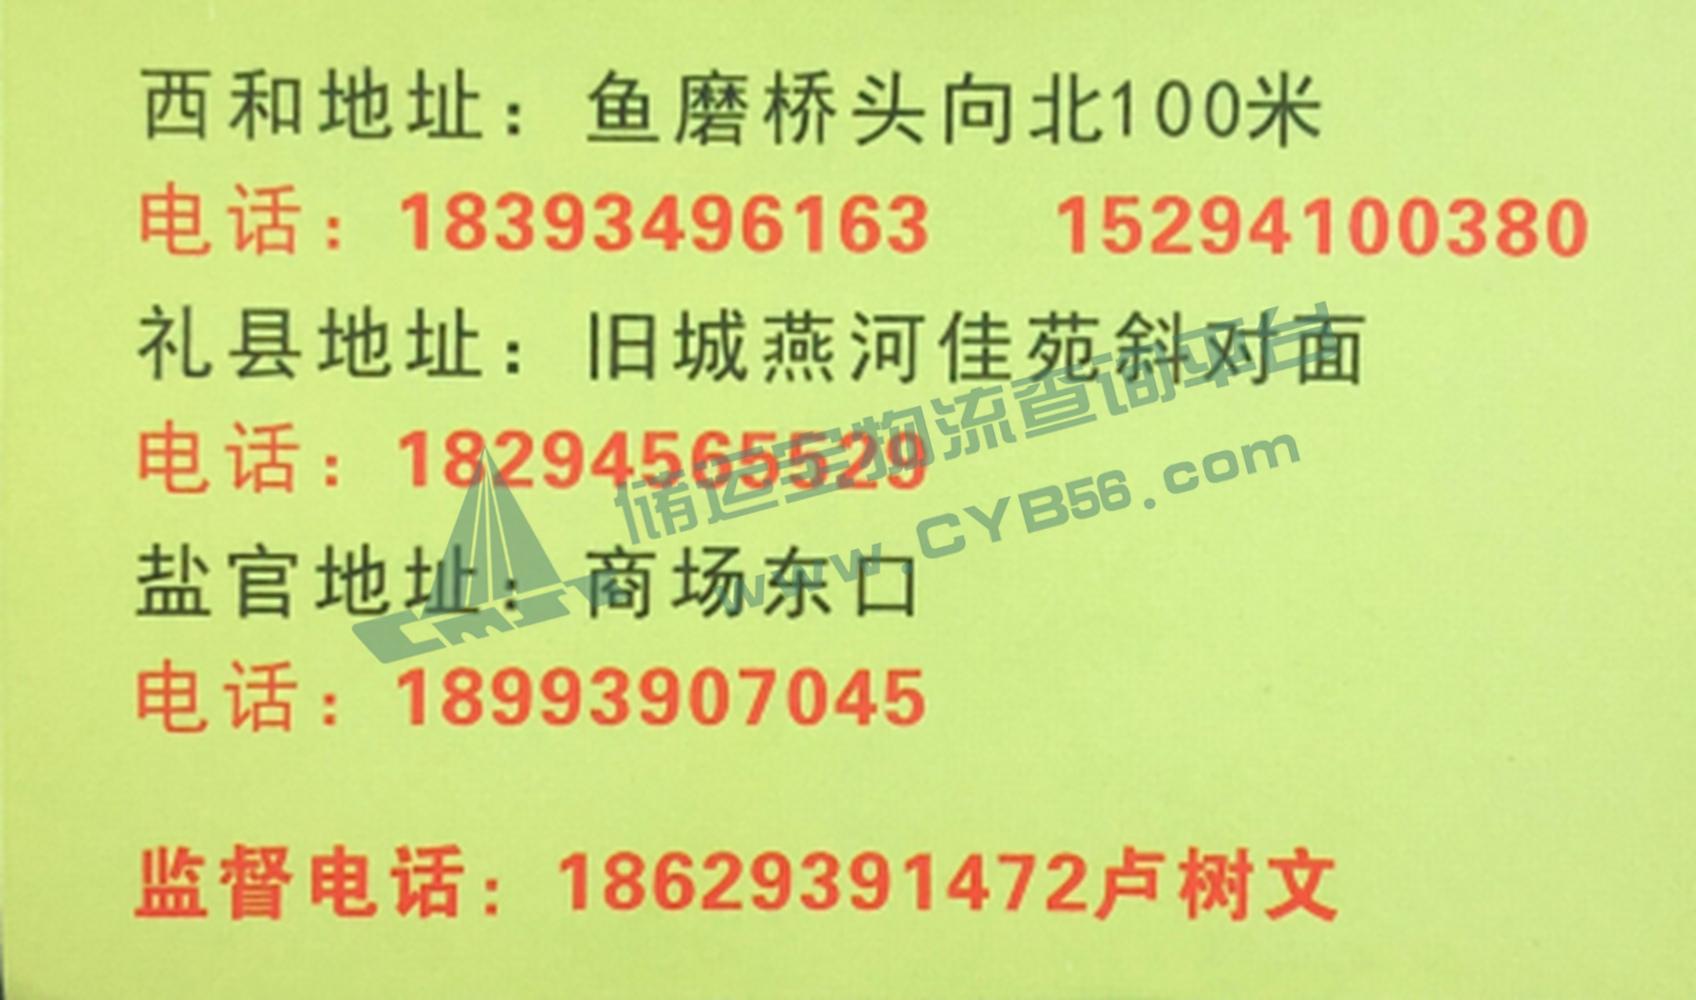 fc4d7a30a431b58de9085e214887c20.jpg